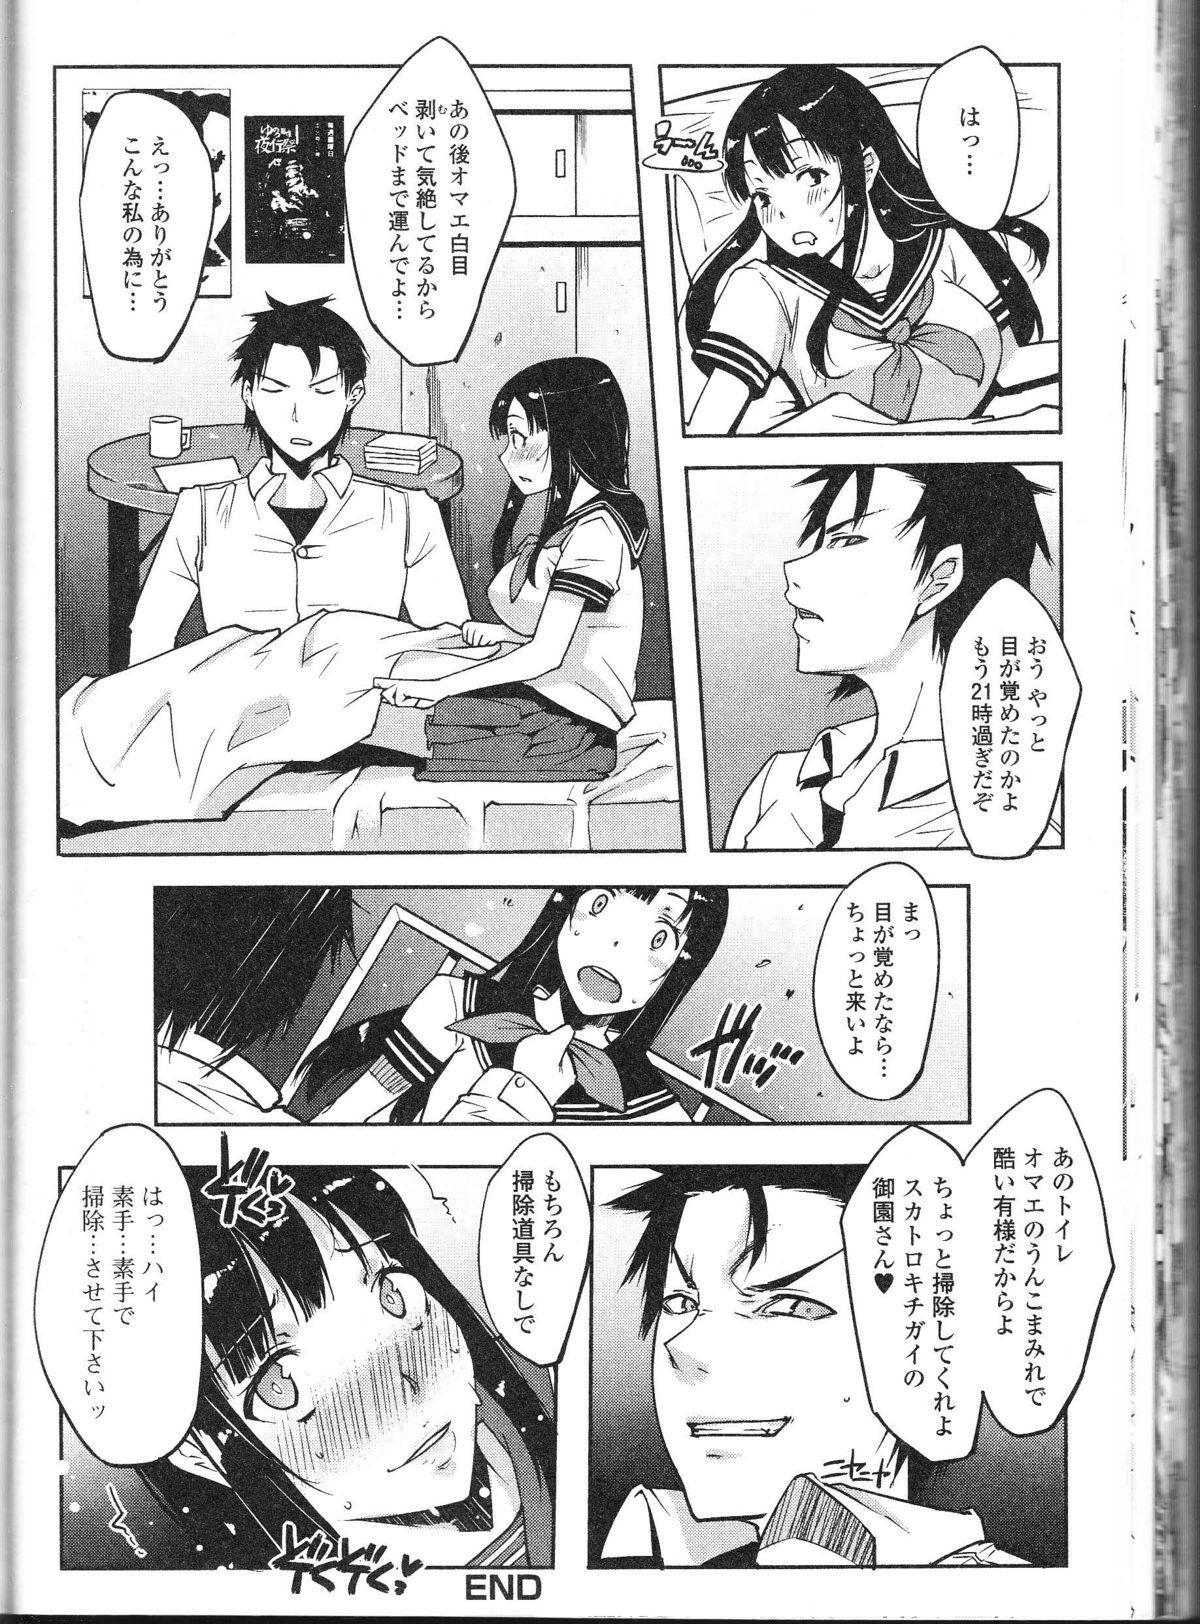 Nozoite wa Ikenai 9 - Do Not Peep! 9 86